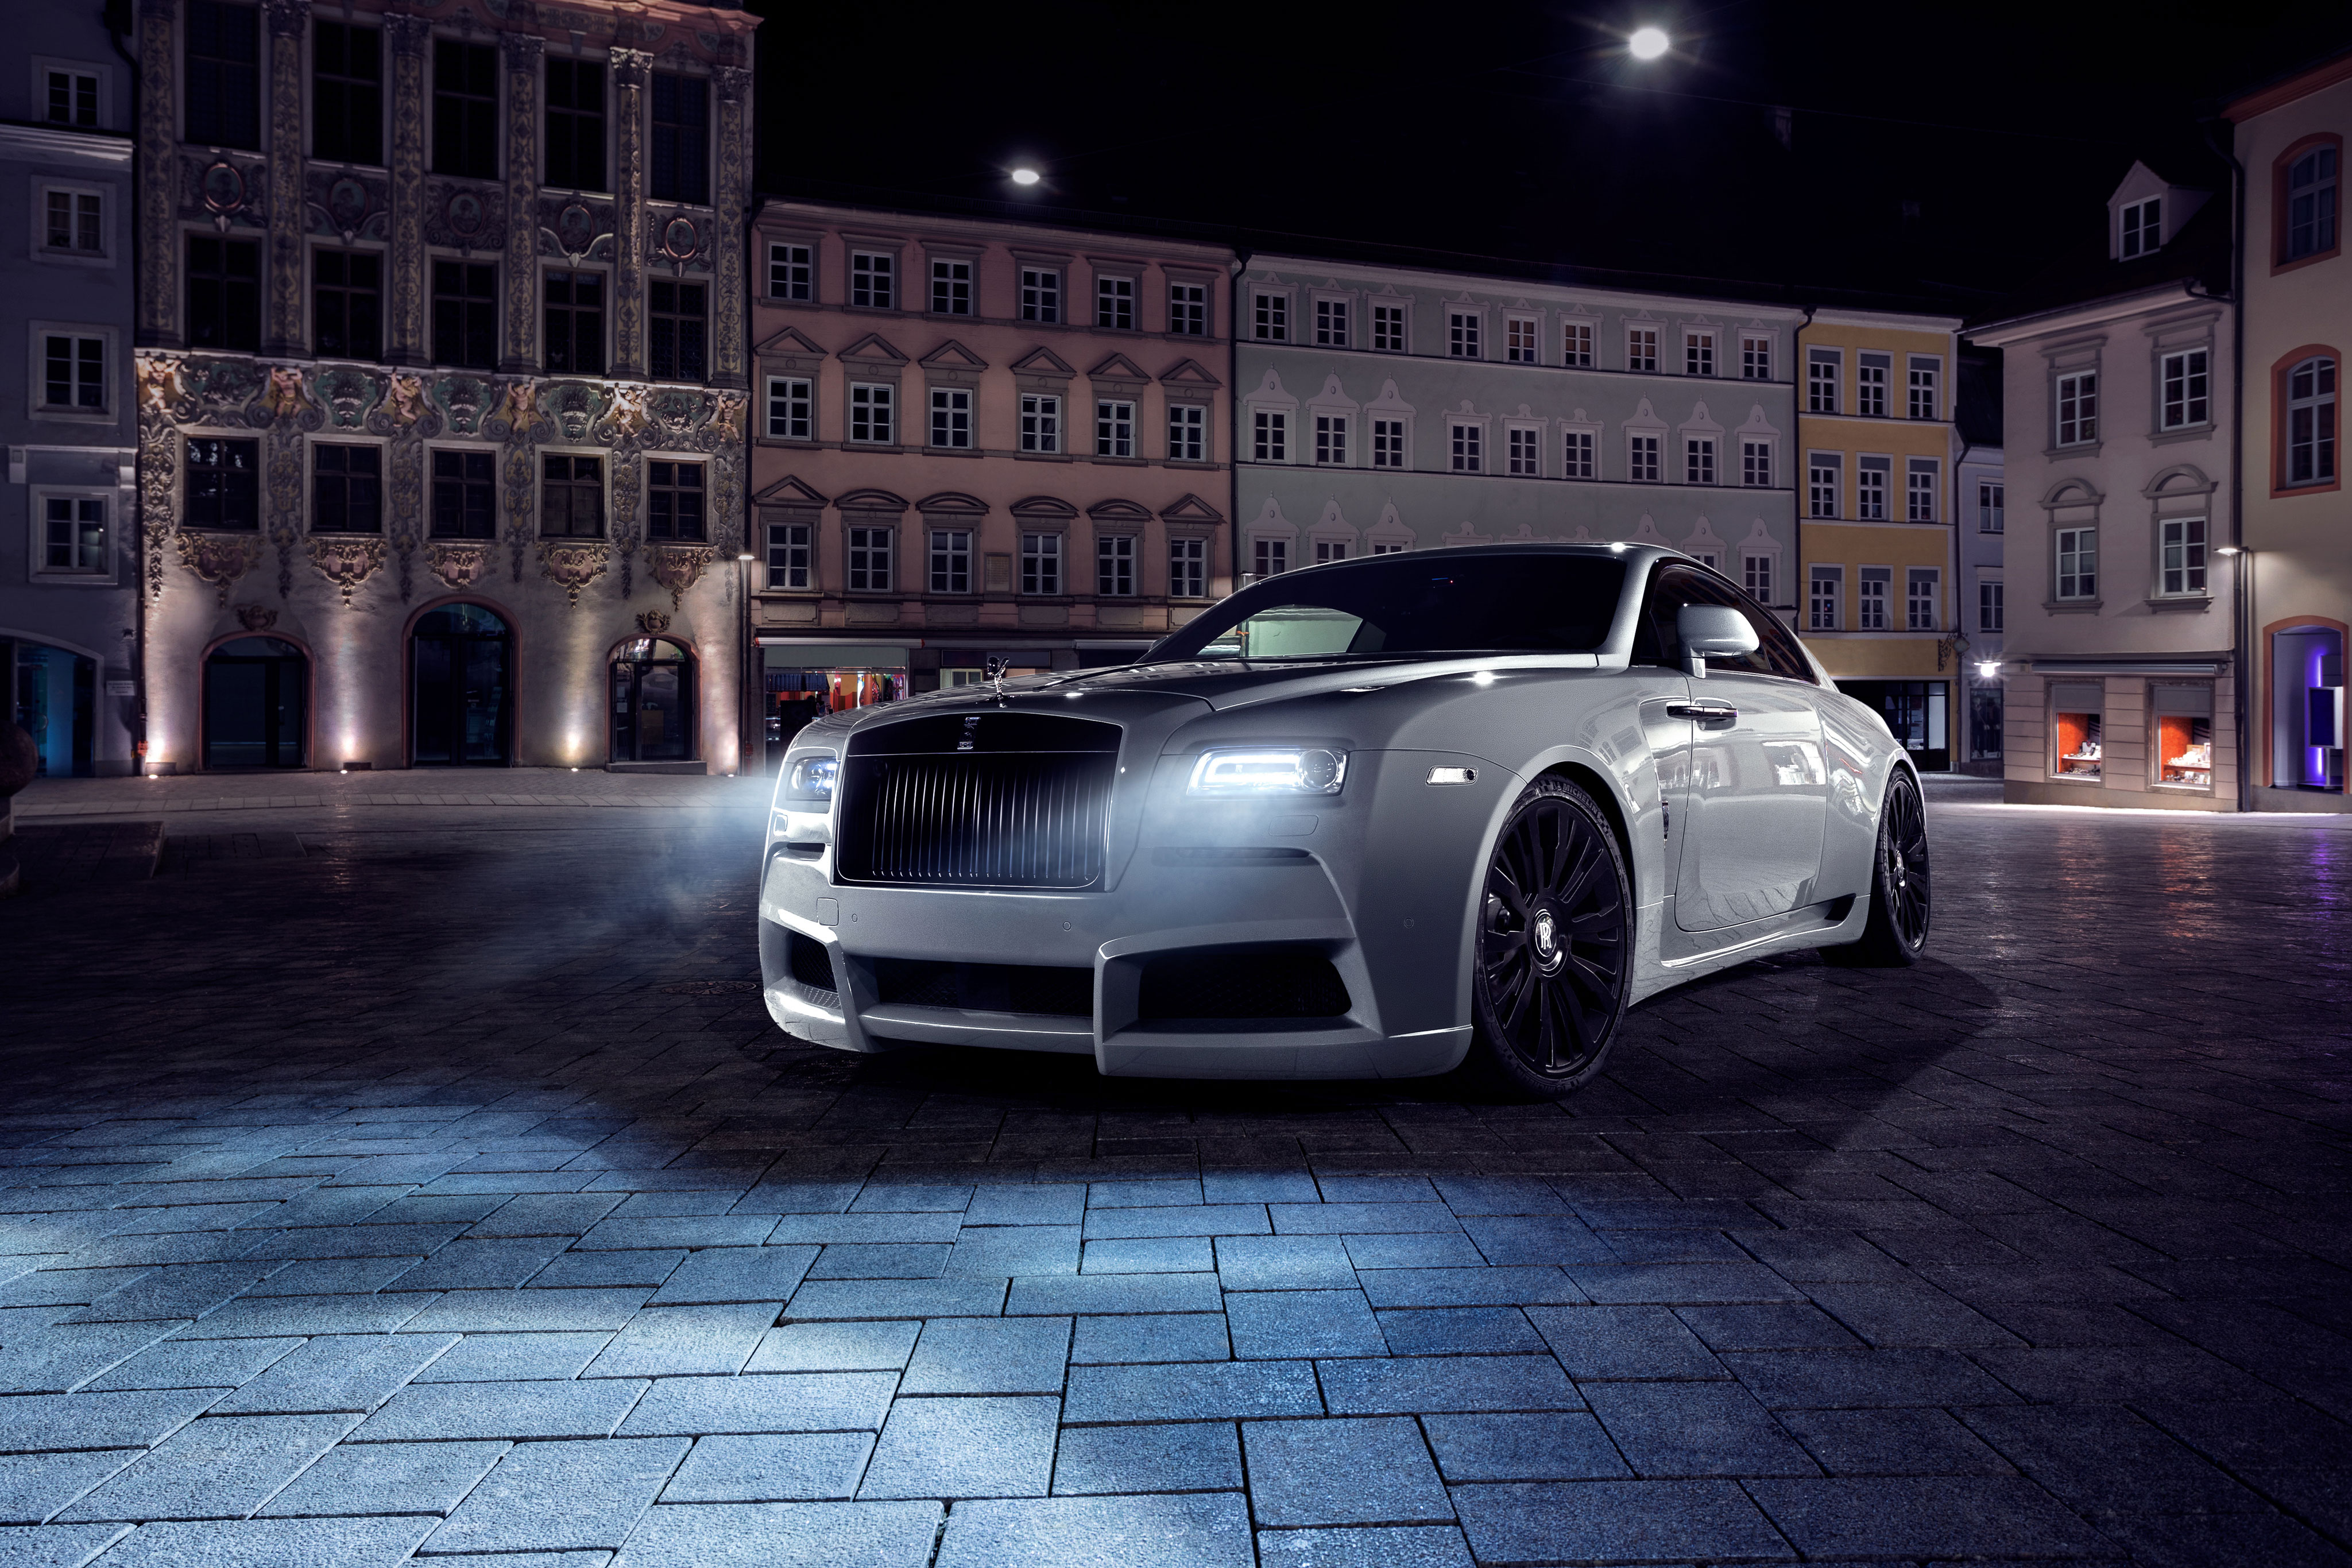 Rolls royce wraith 2017 4k hd cars 4k wallpapers images - Rolls royce wallpaper download ...